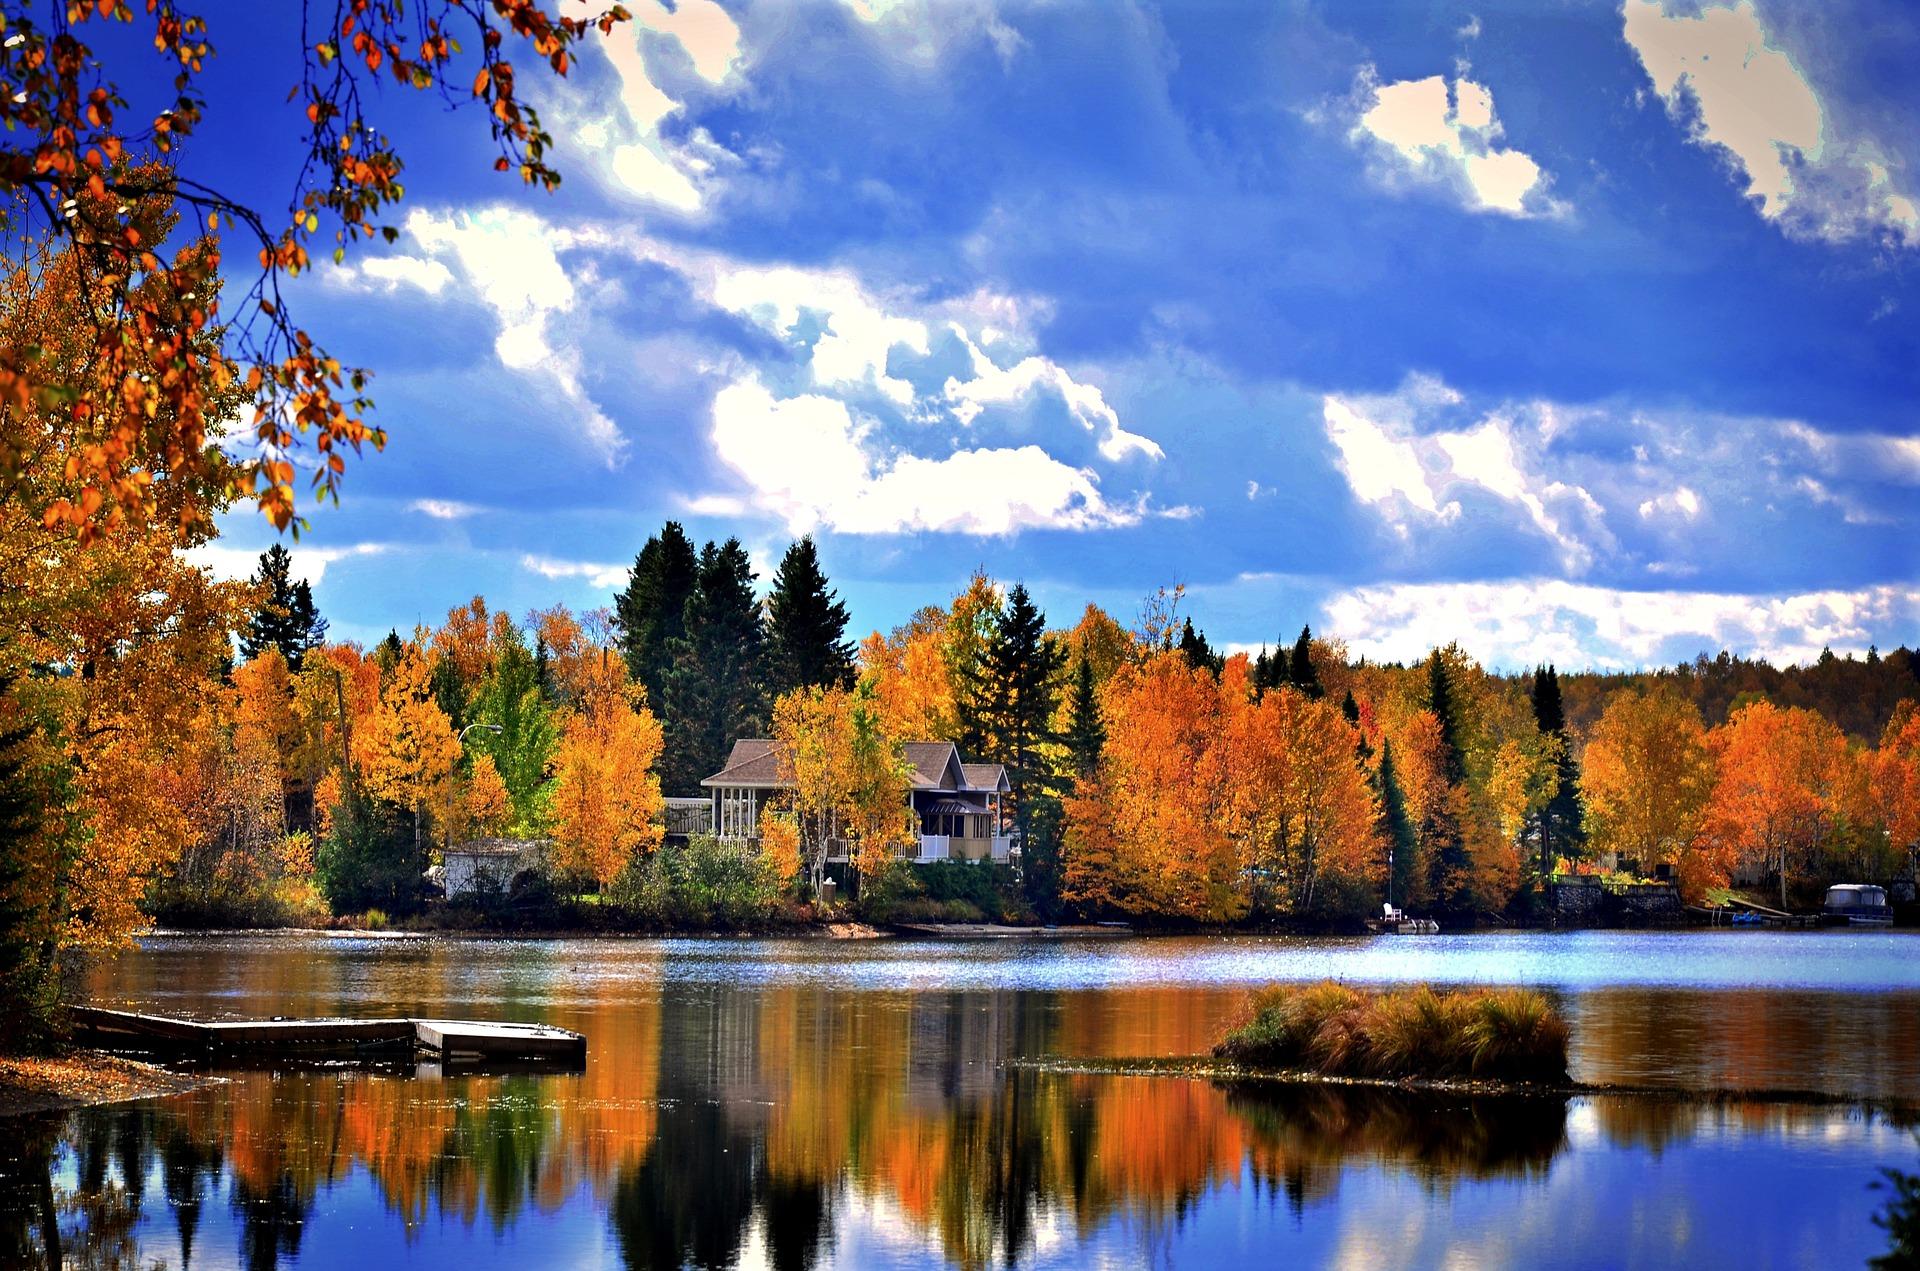 autumn-landscape-1138875_1920.jpg